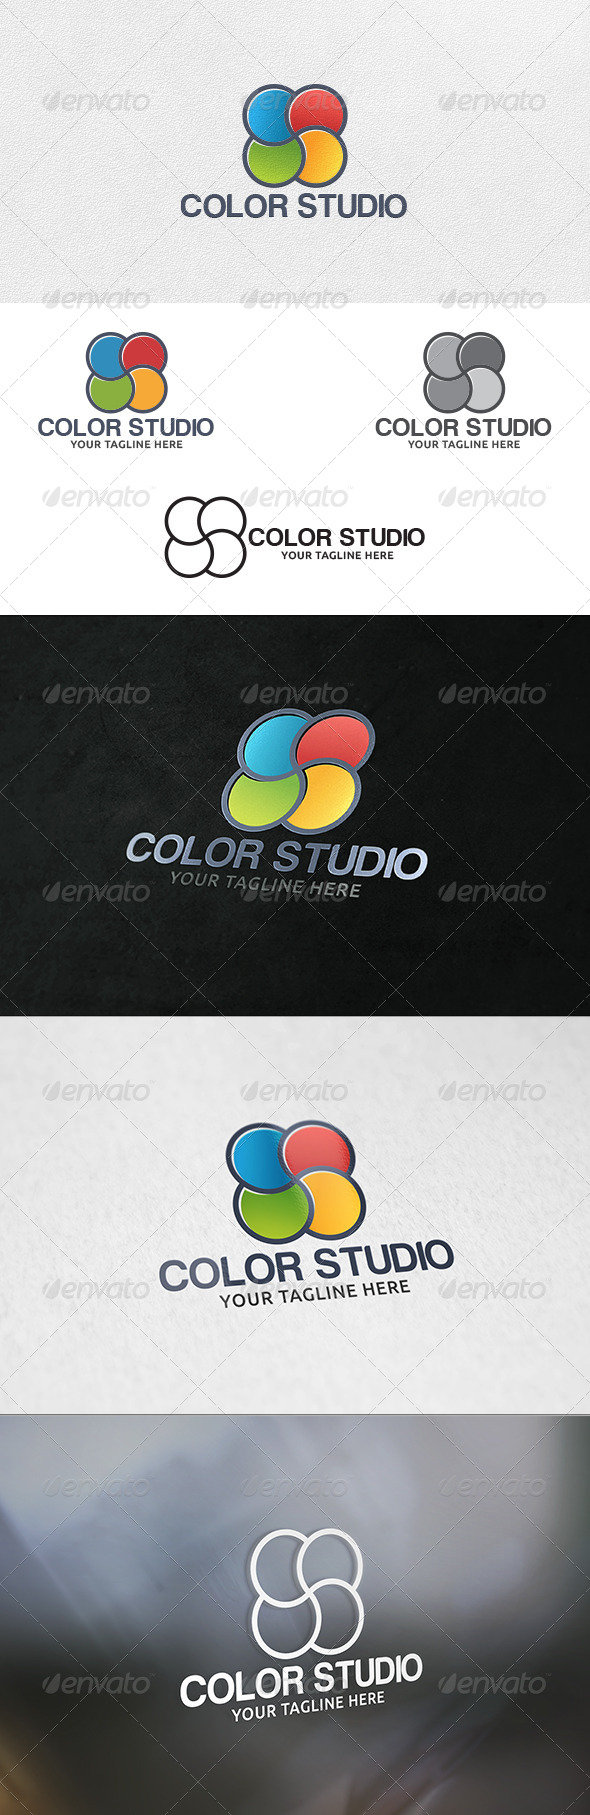 Color Studio - Logo Template - Vector Abstract